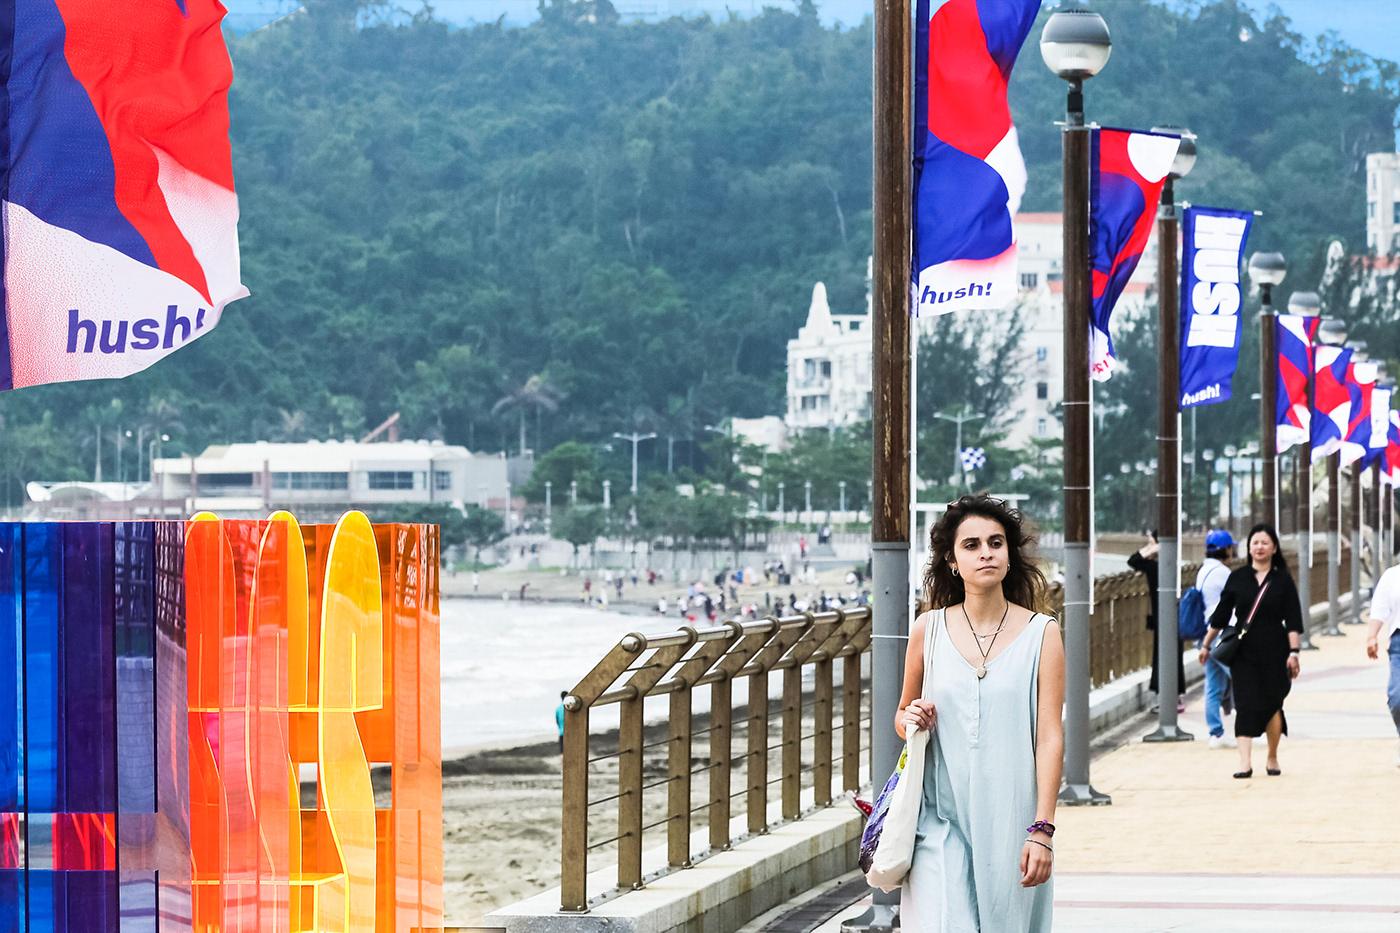 hush full music music festival Macao macau design graphic design  untitled macao AU CHON HIN adobeawards